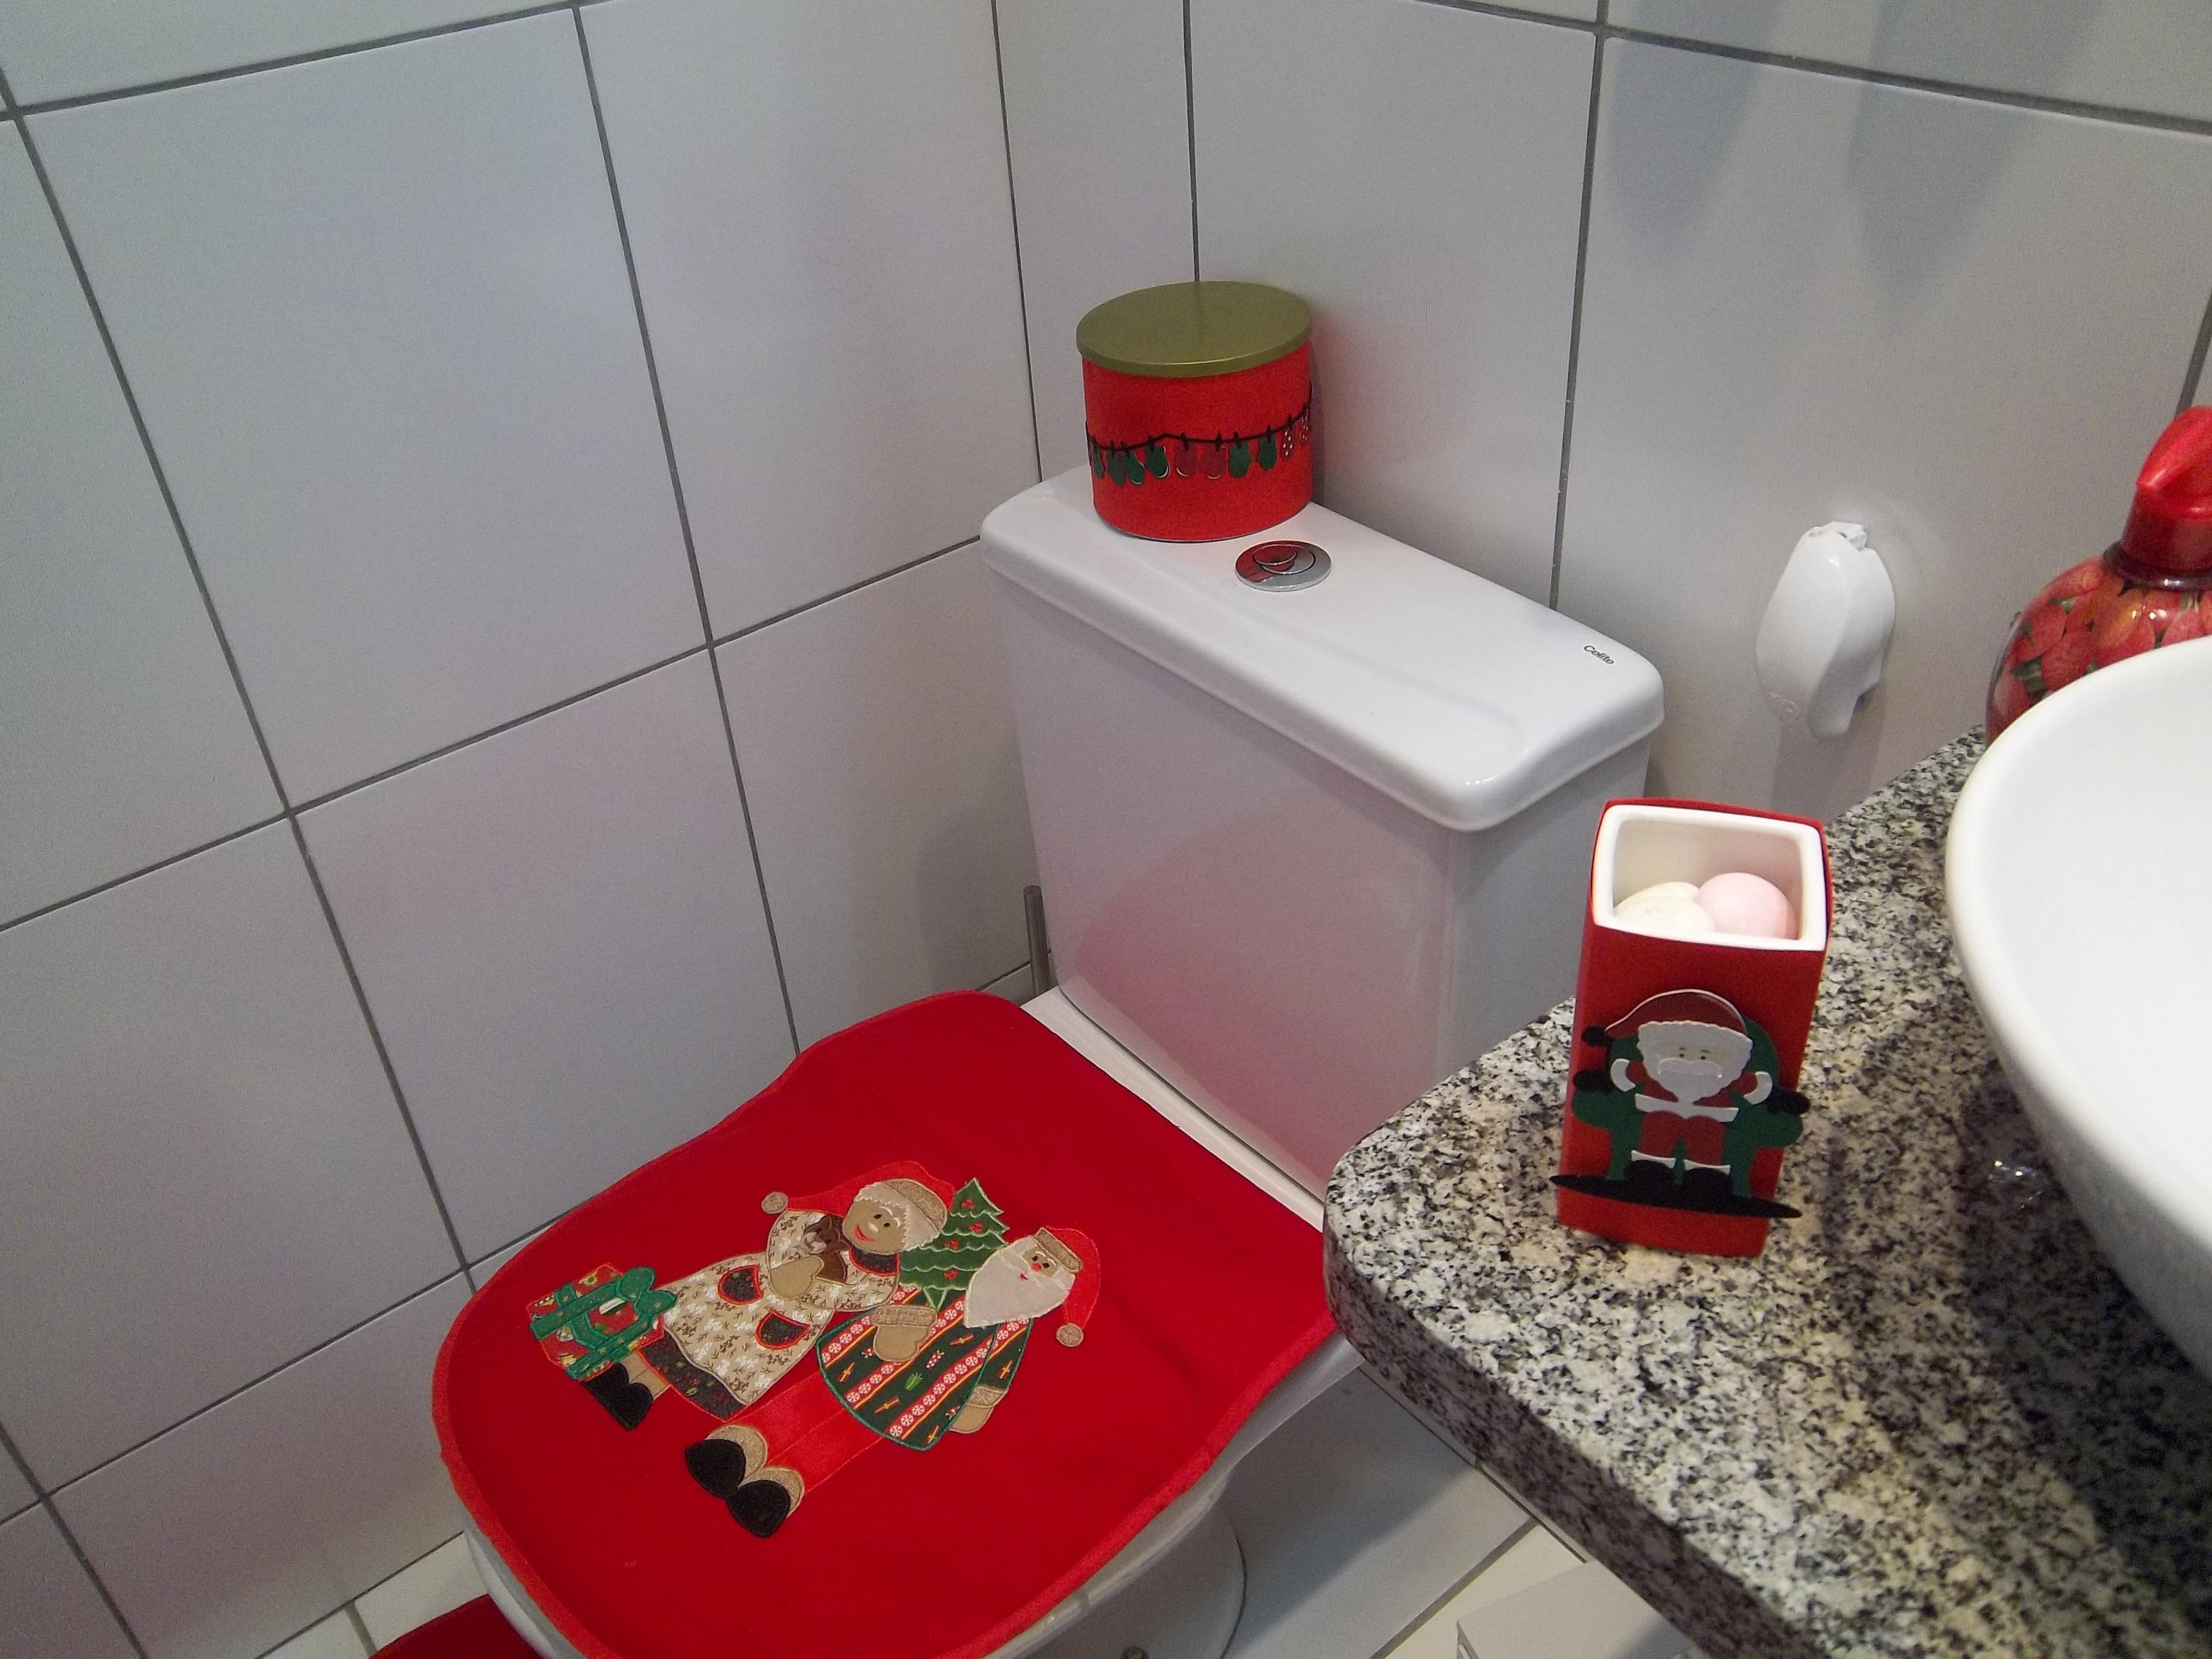 decoracao de lavabo para o natal : decoracao de lavabo para o natal: -de-natal-lavabo-papai-noel decoracao-de-natal-lavabo-decoracao-natal